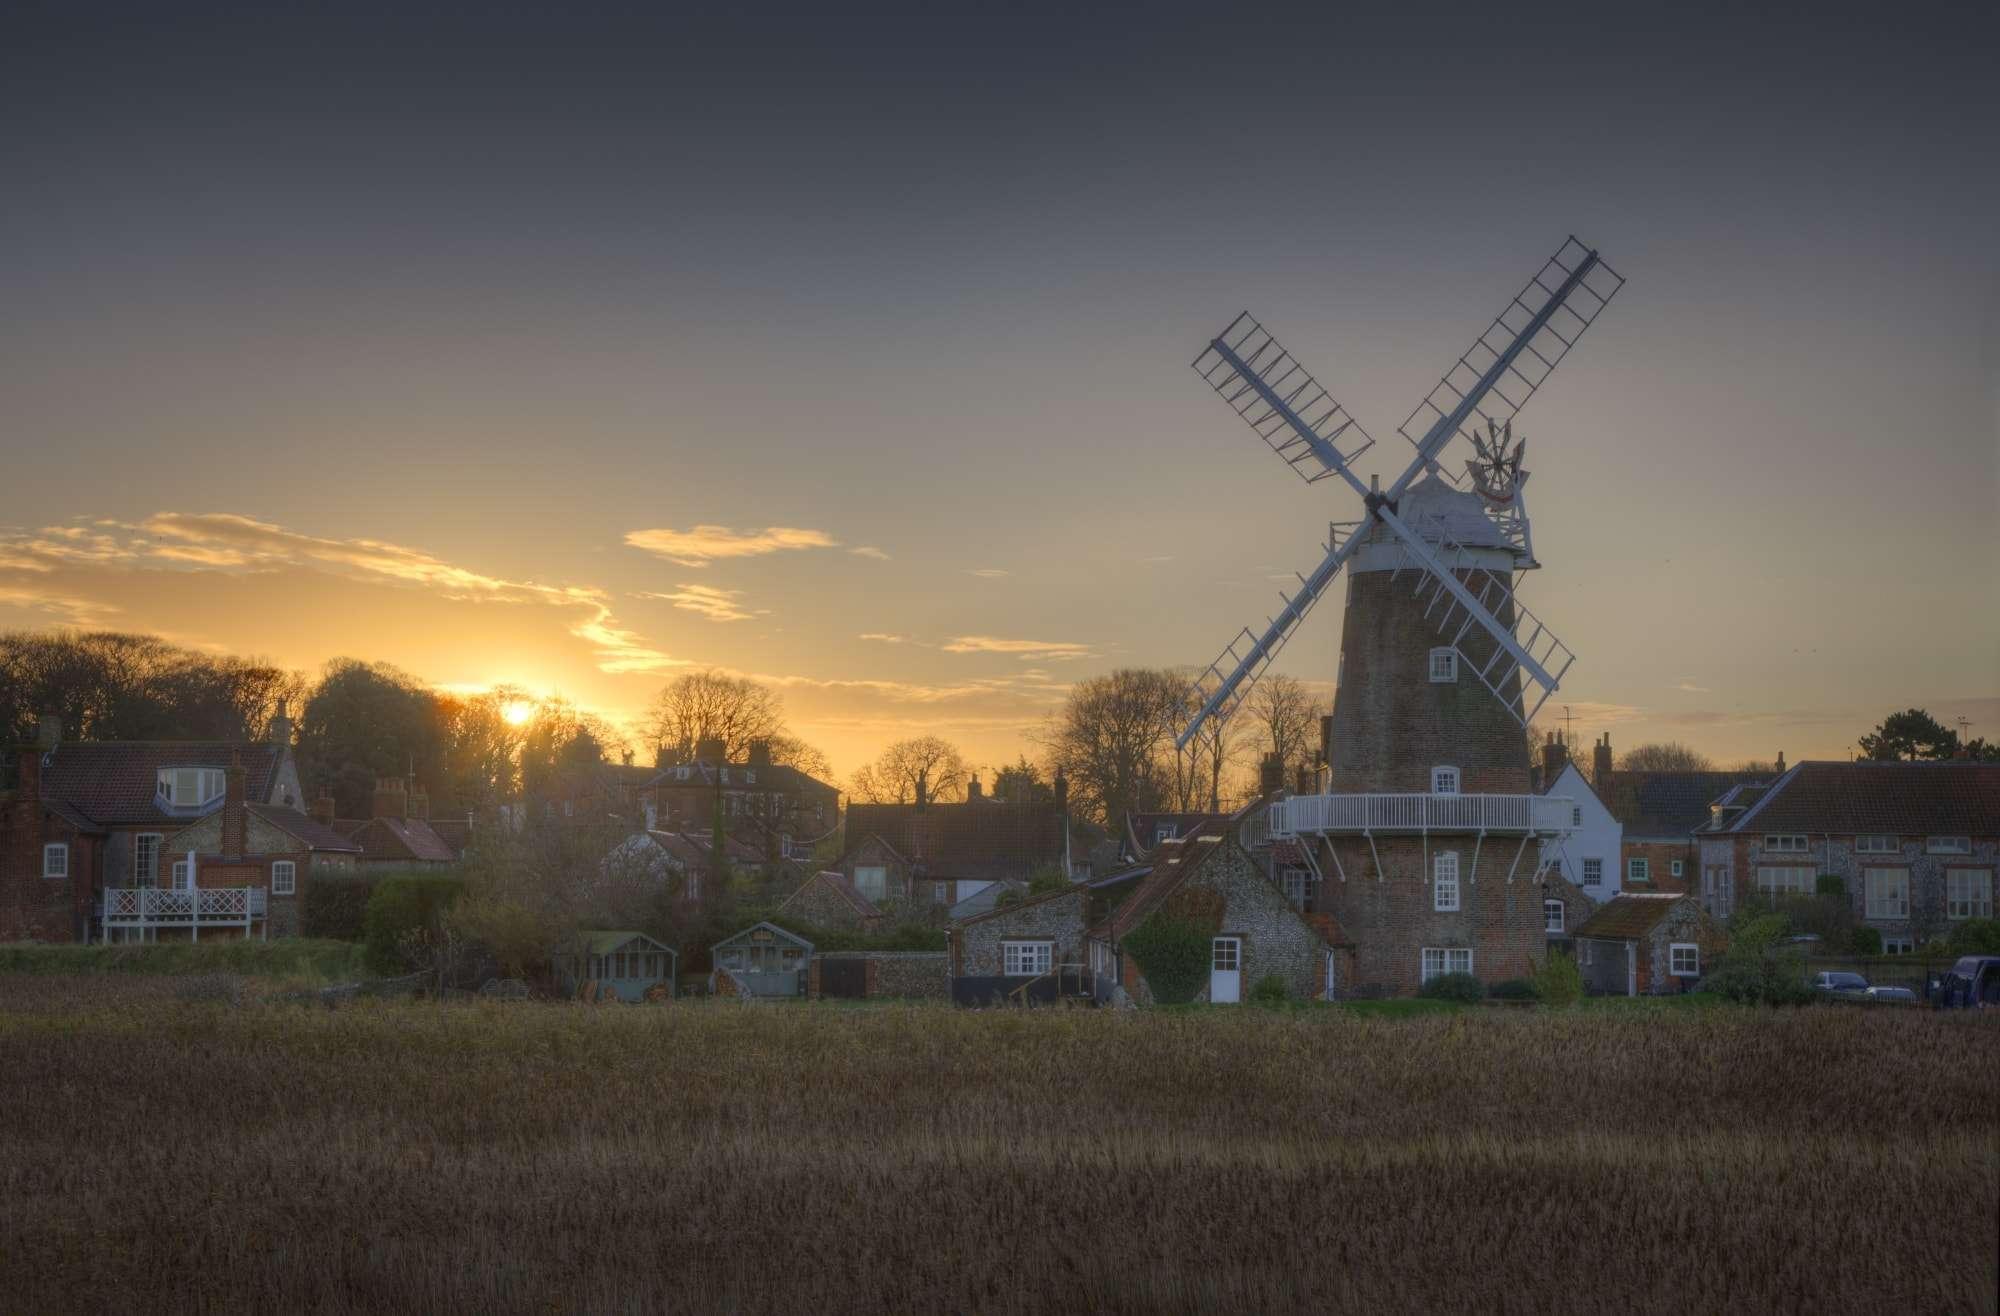 Image of Windmill in coastal village of Blakeney, Norfolk, England